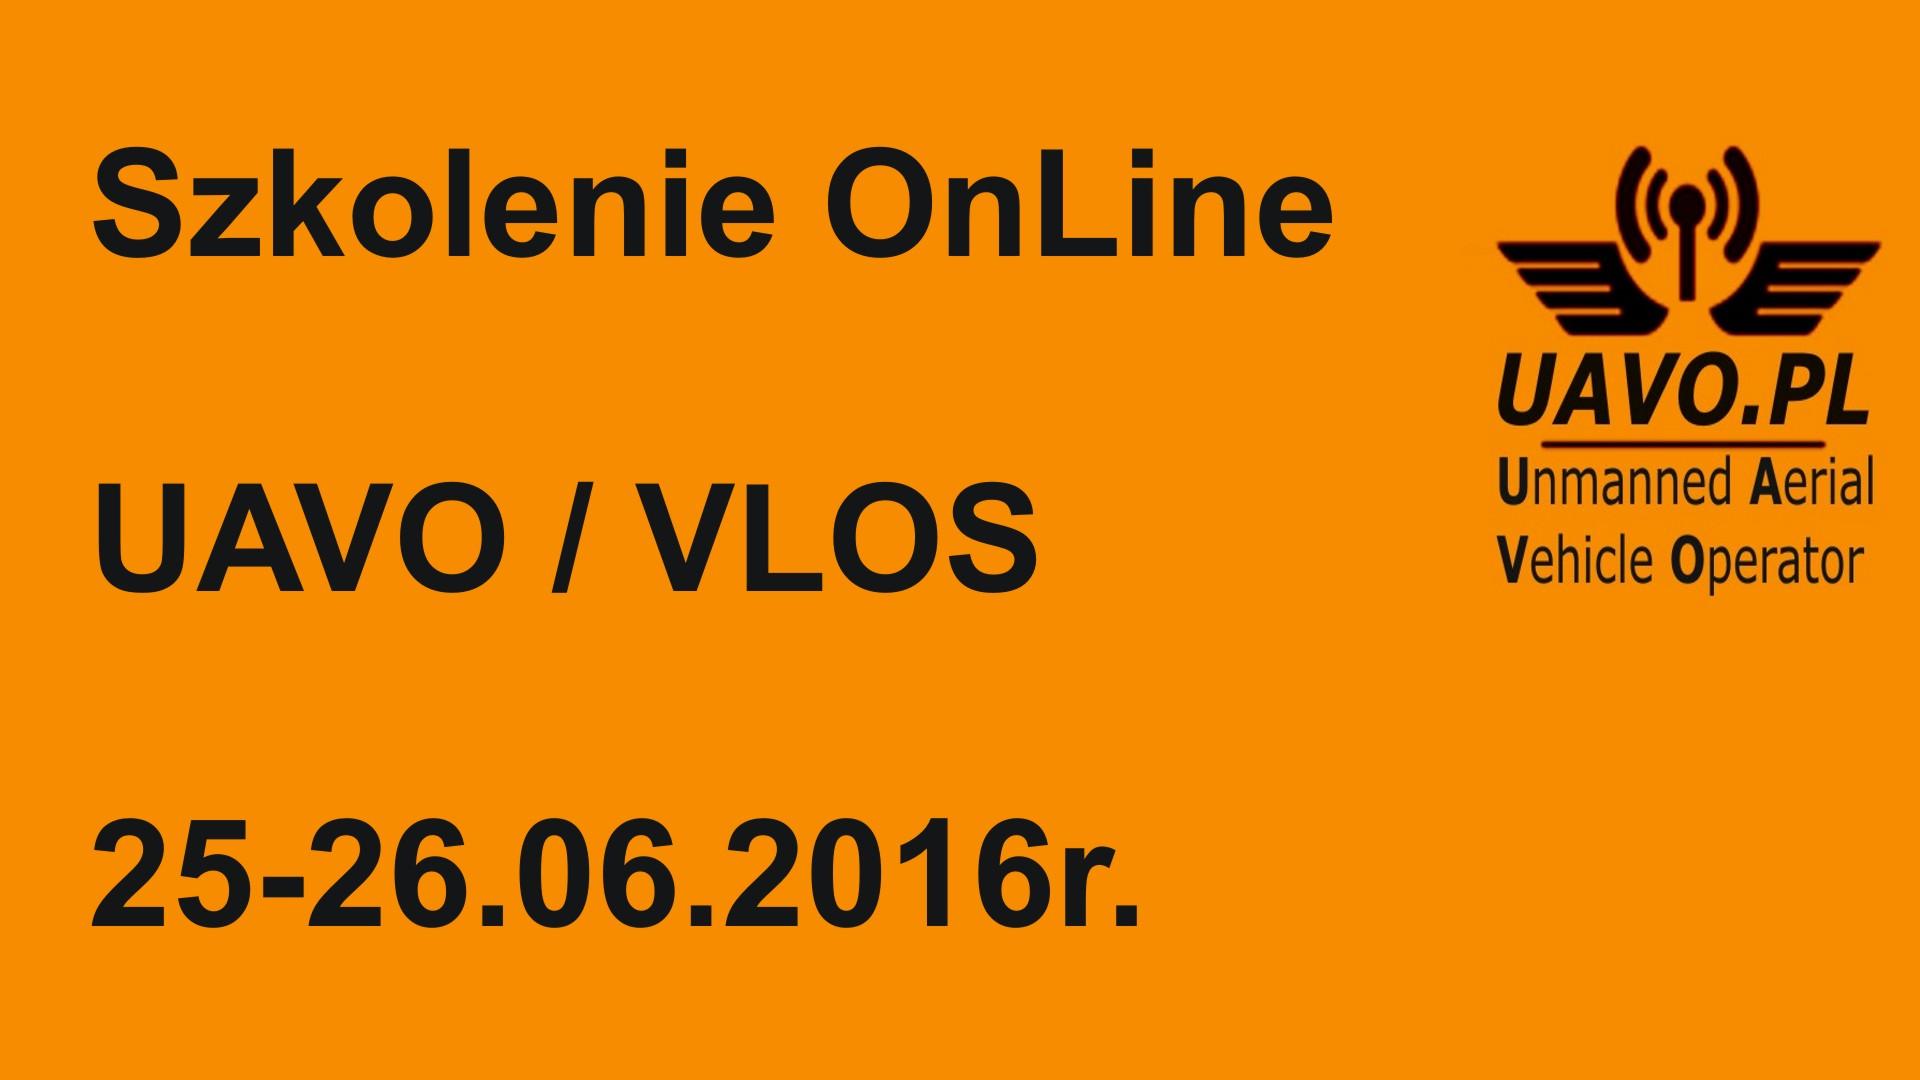 szkolenie_online_vlos_uavo